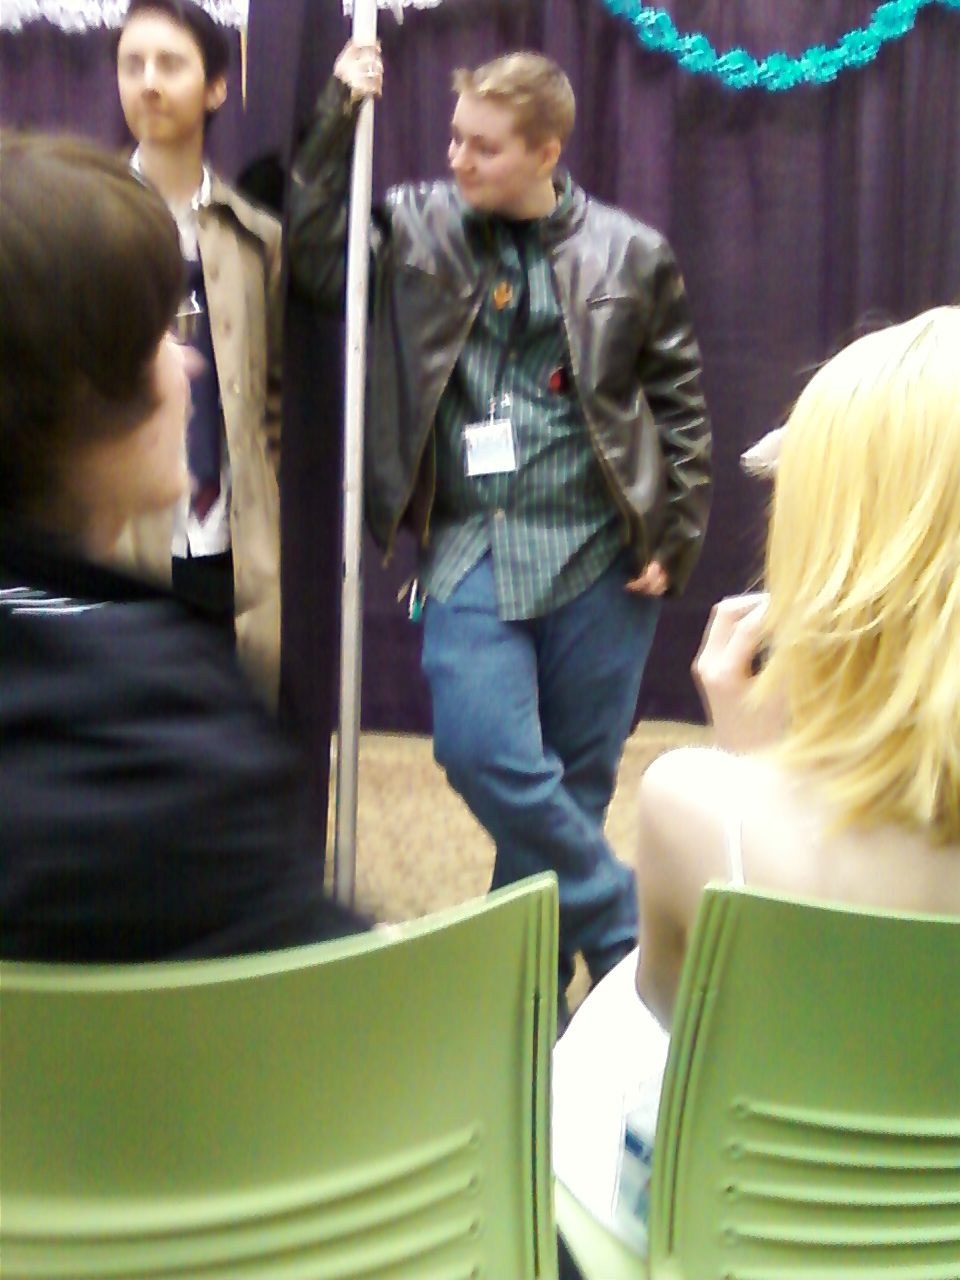 semi blurry Dean and Cas by regates